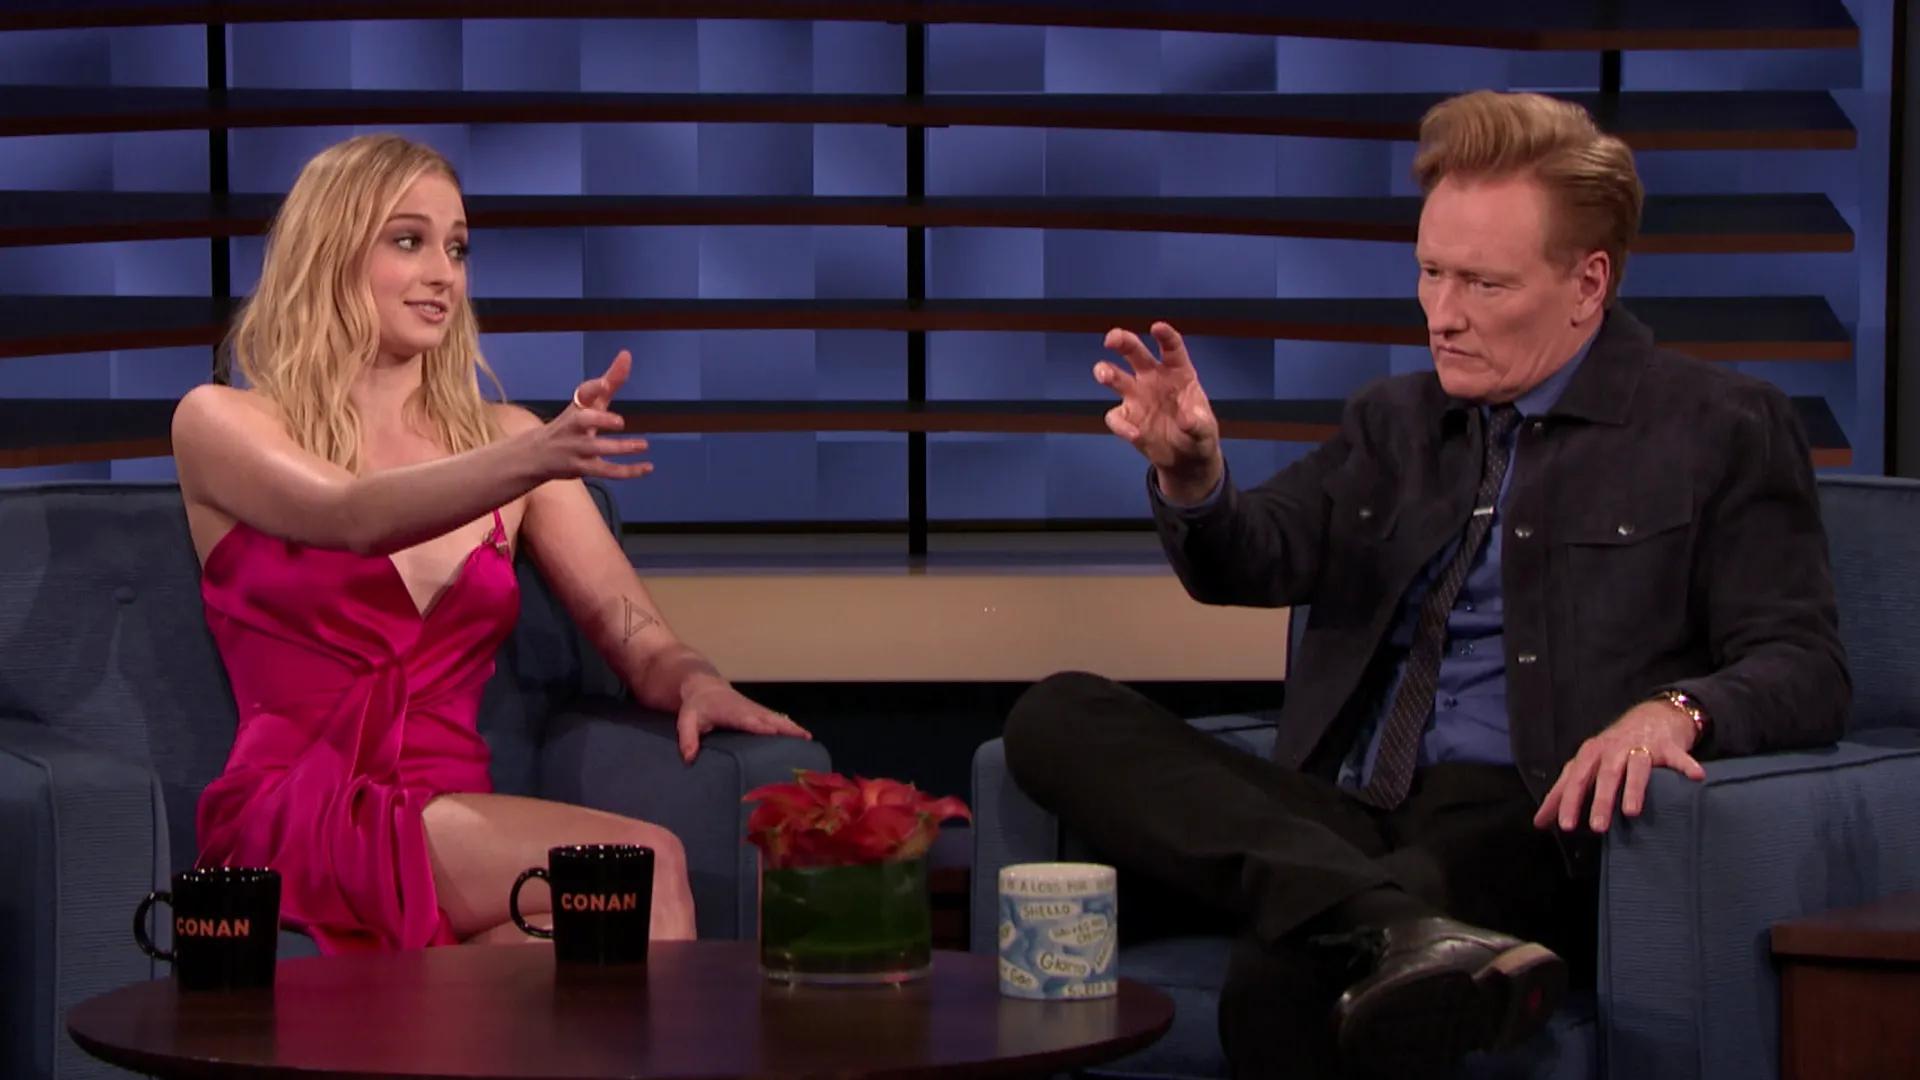 Conan O'Brien and Sophie Turner in Sophie Turner (2019)